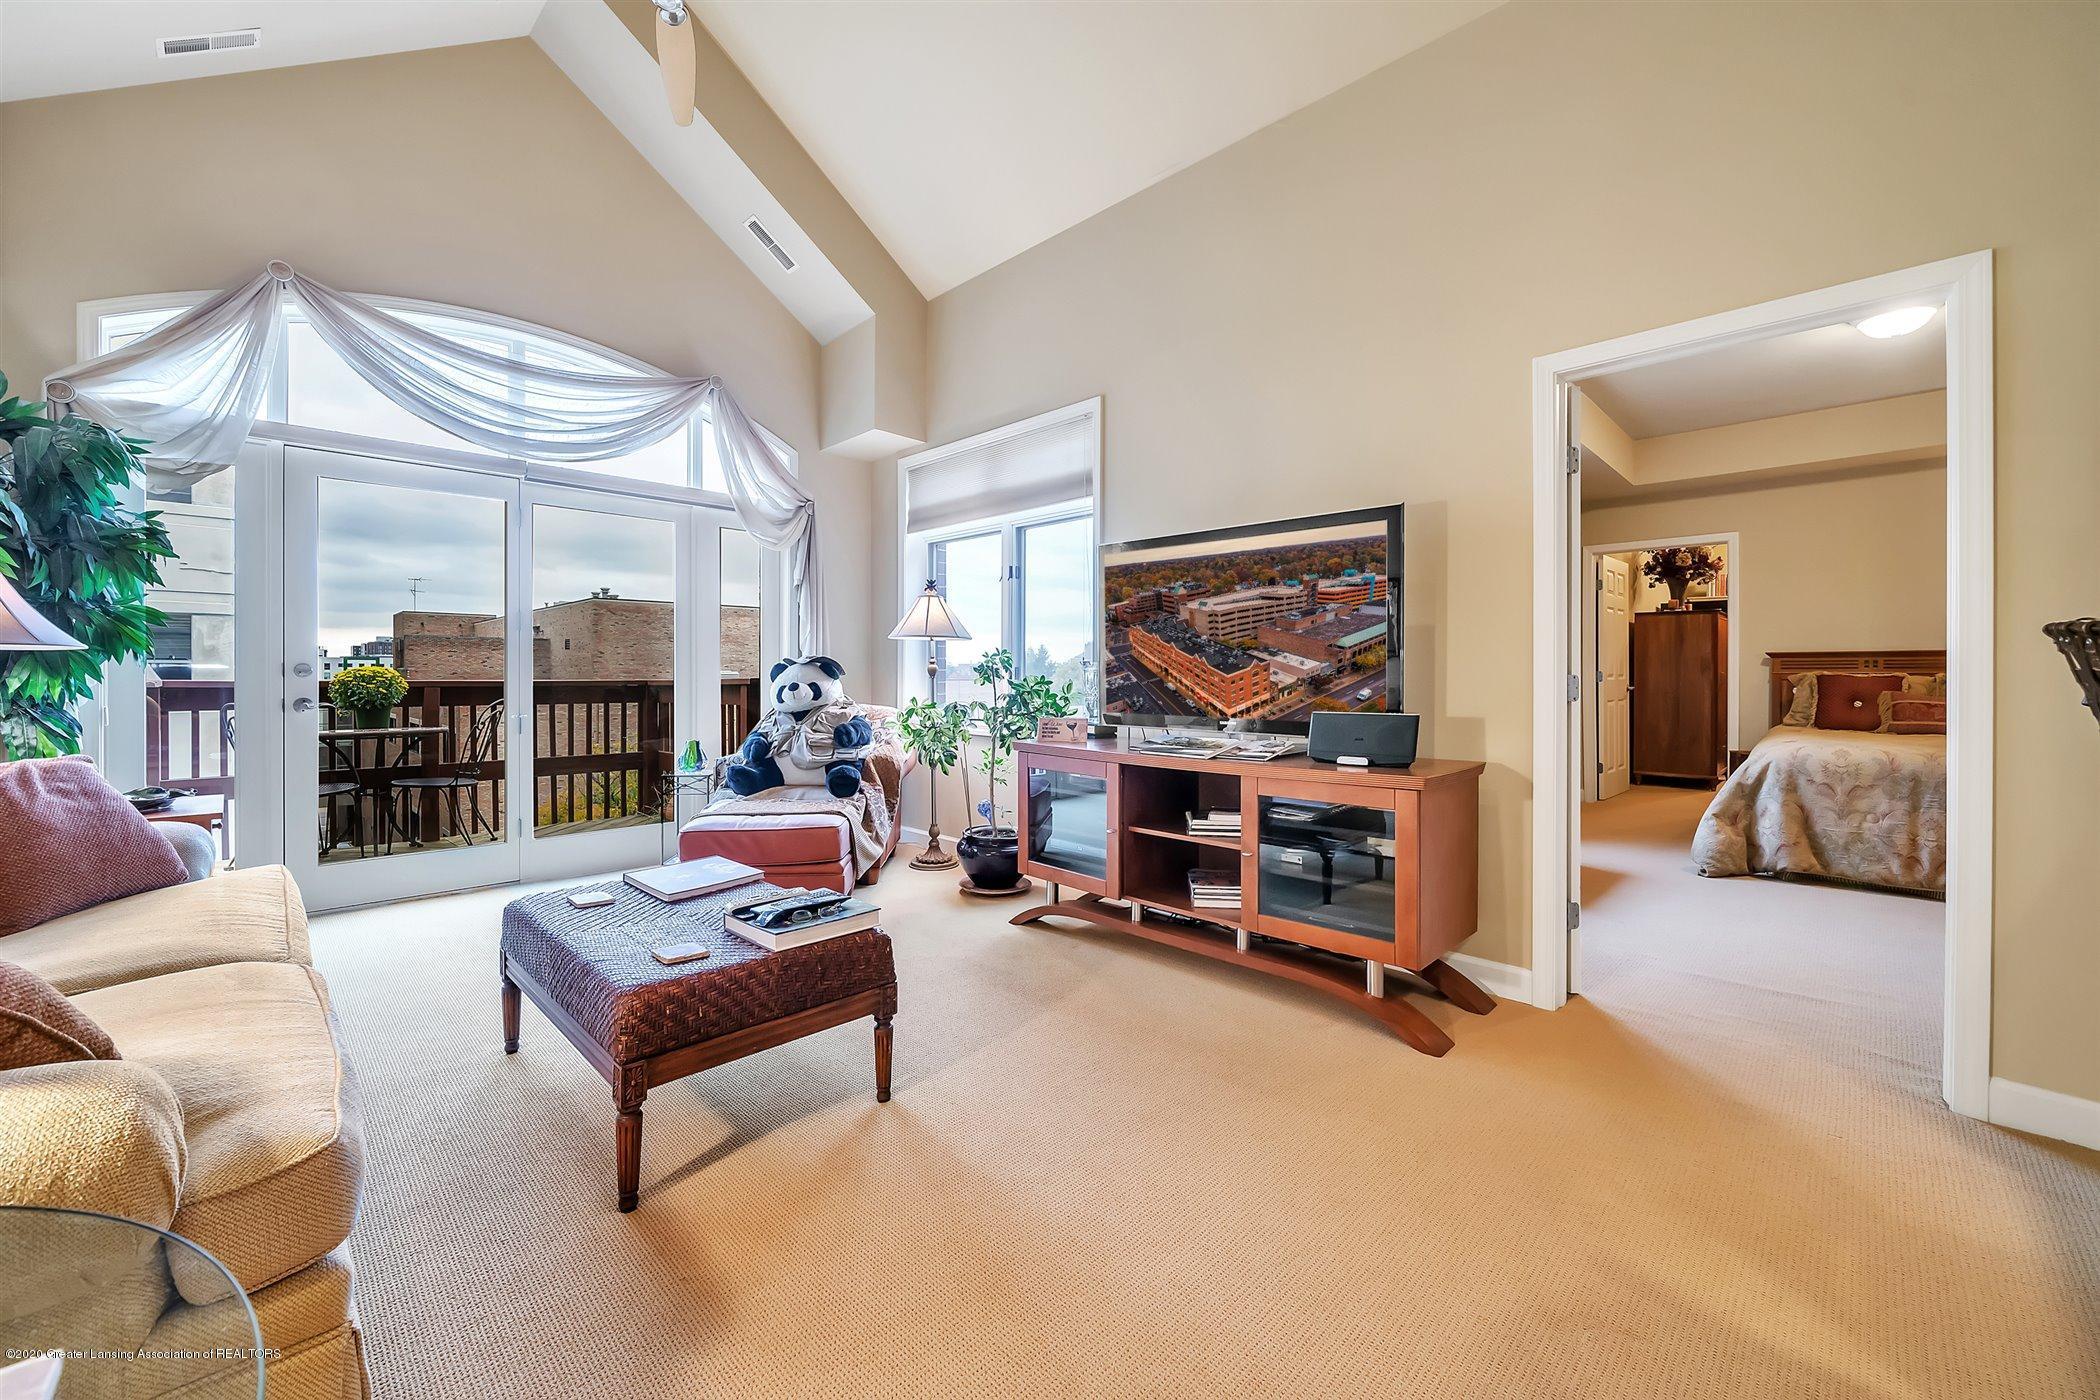 220 M. A. C. Ave Apt 409 - Living Room - 1